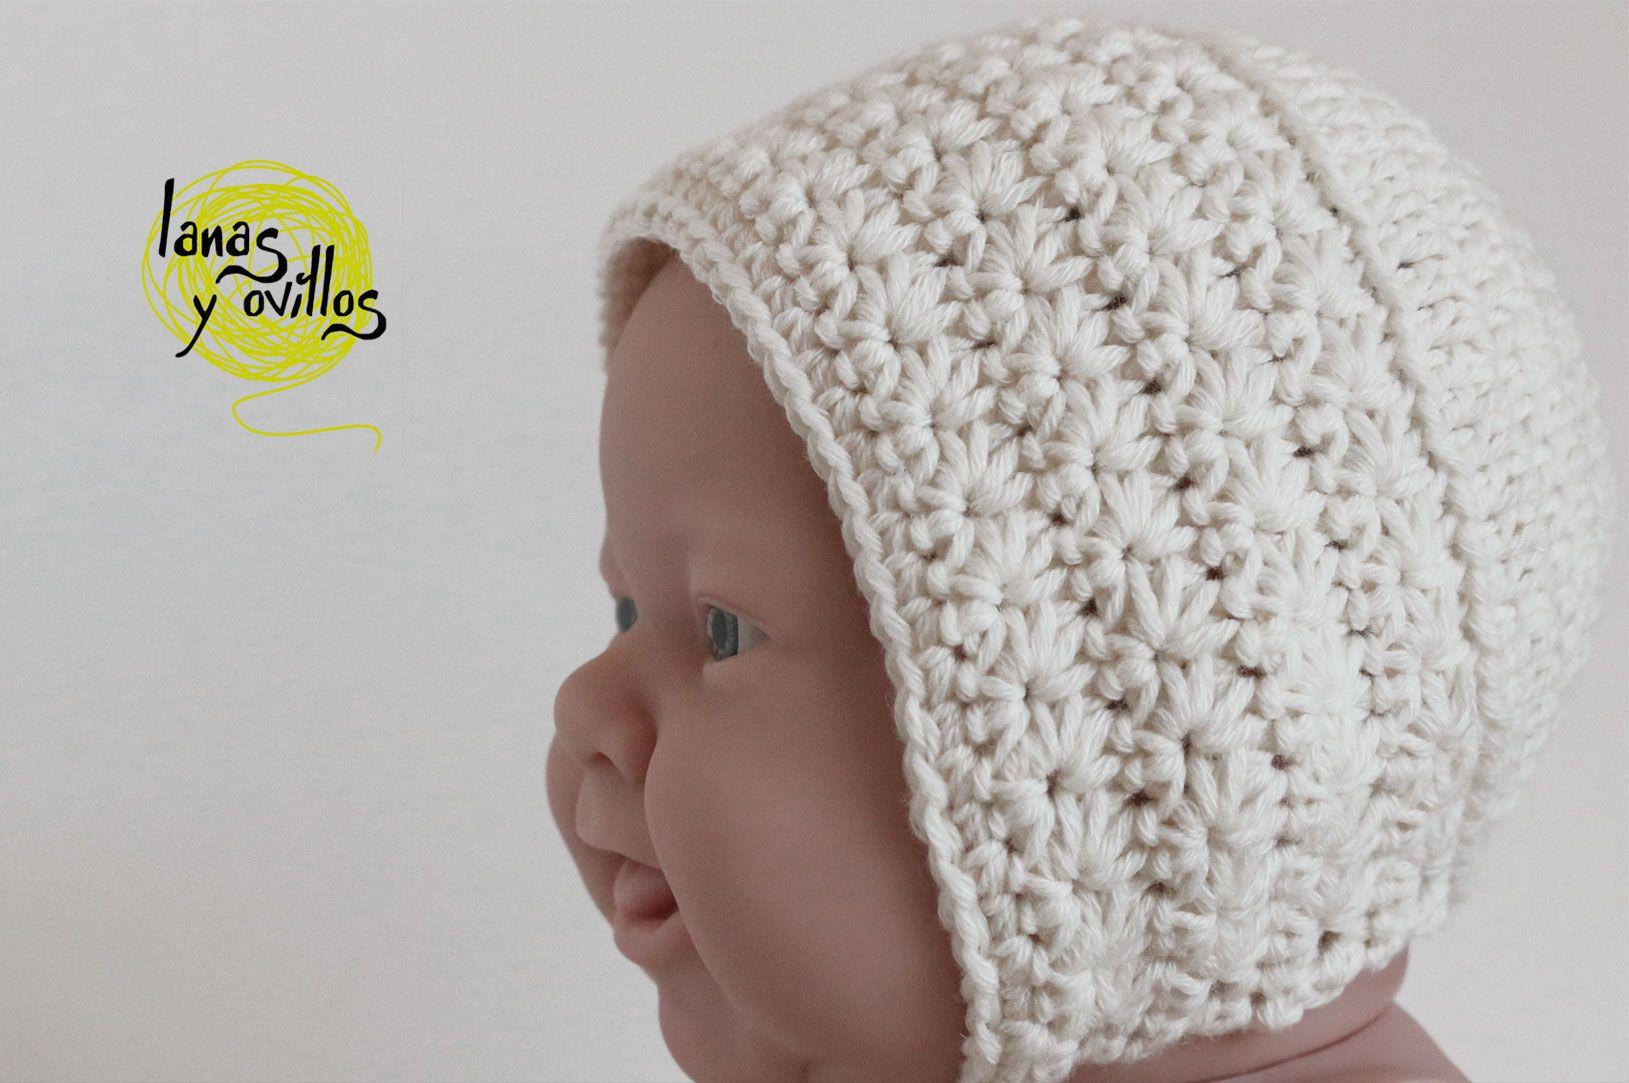 GORRO VINTAGE BEBÉ | Lanas y ovillos | Crochet | Pinterest ...